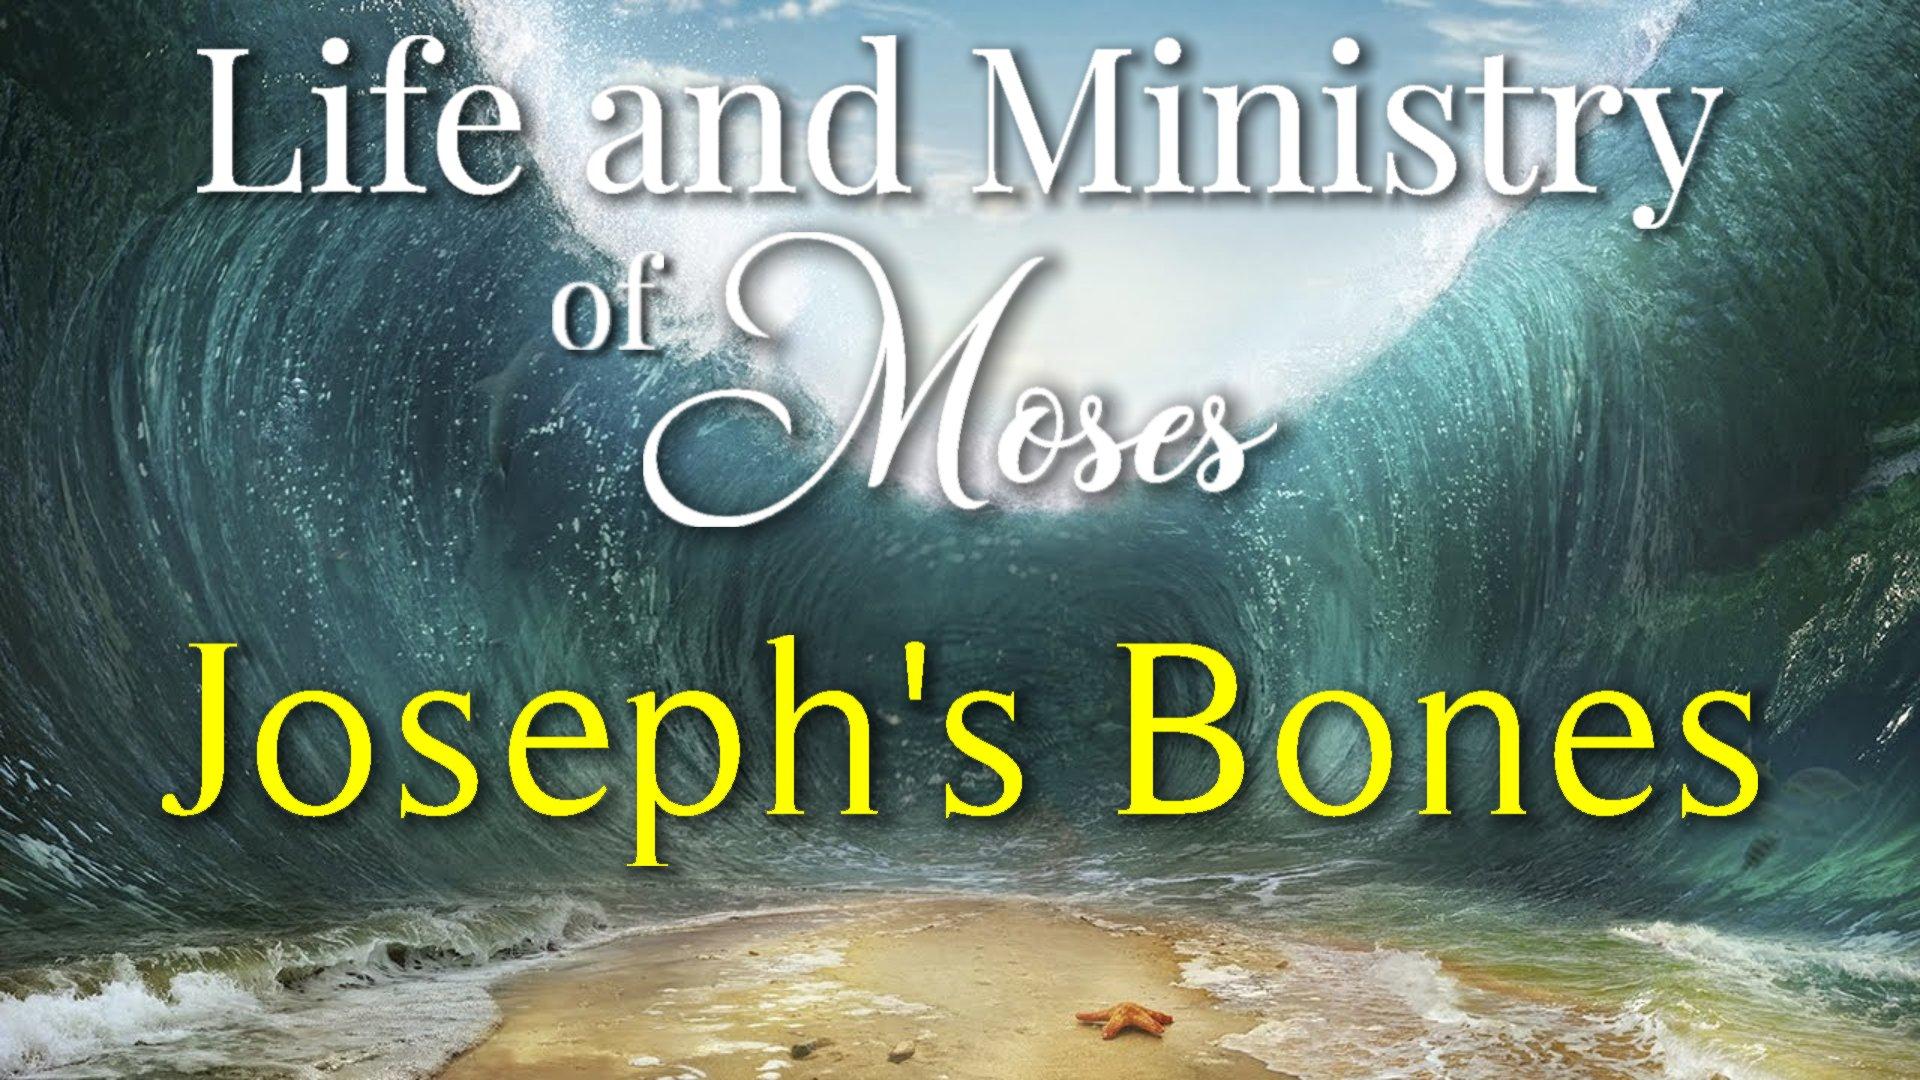 13 Joseph's Bones